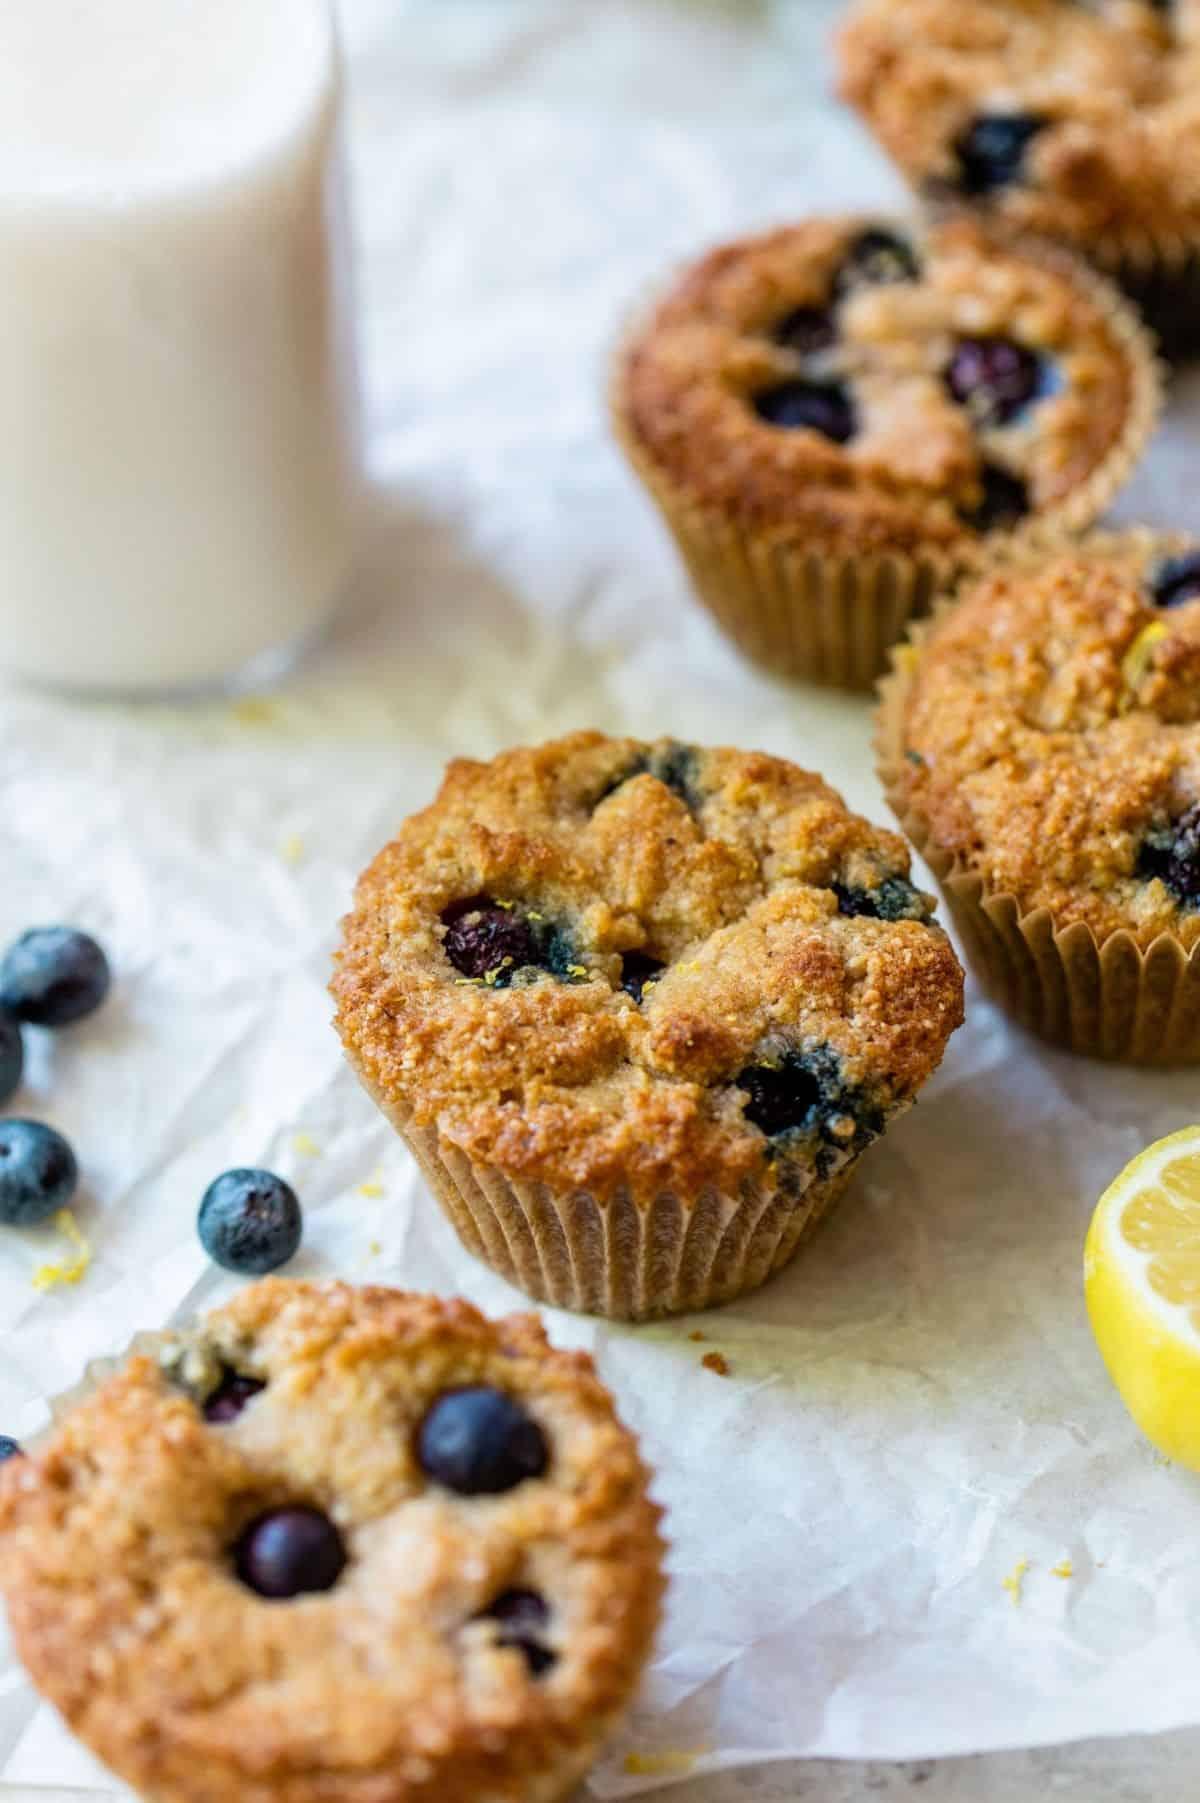 muffins near fresh blueberries and lemon